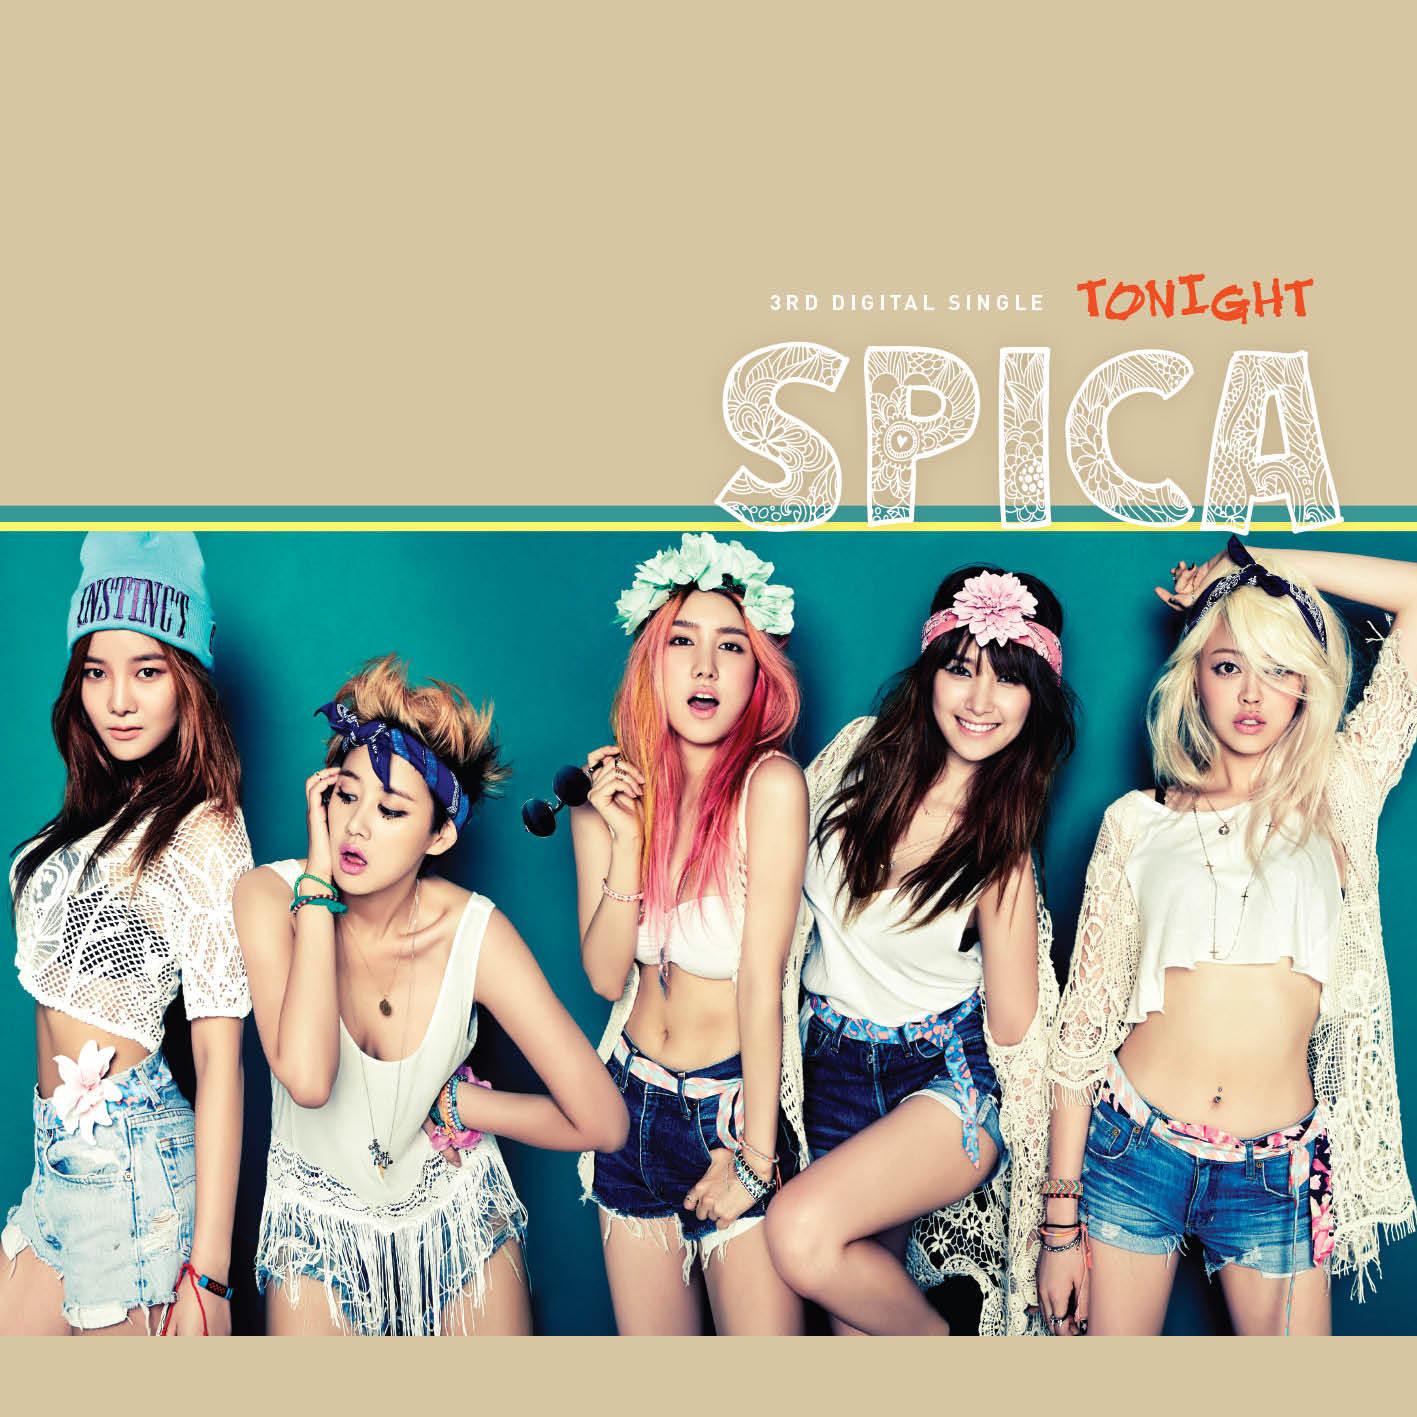 http://seoulbeats.com/wp-content/uploads/2013/08/20130829_seoulbeats_spica1.jpg